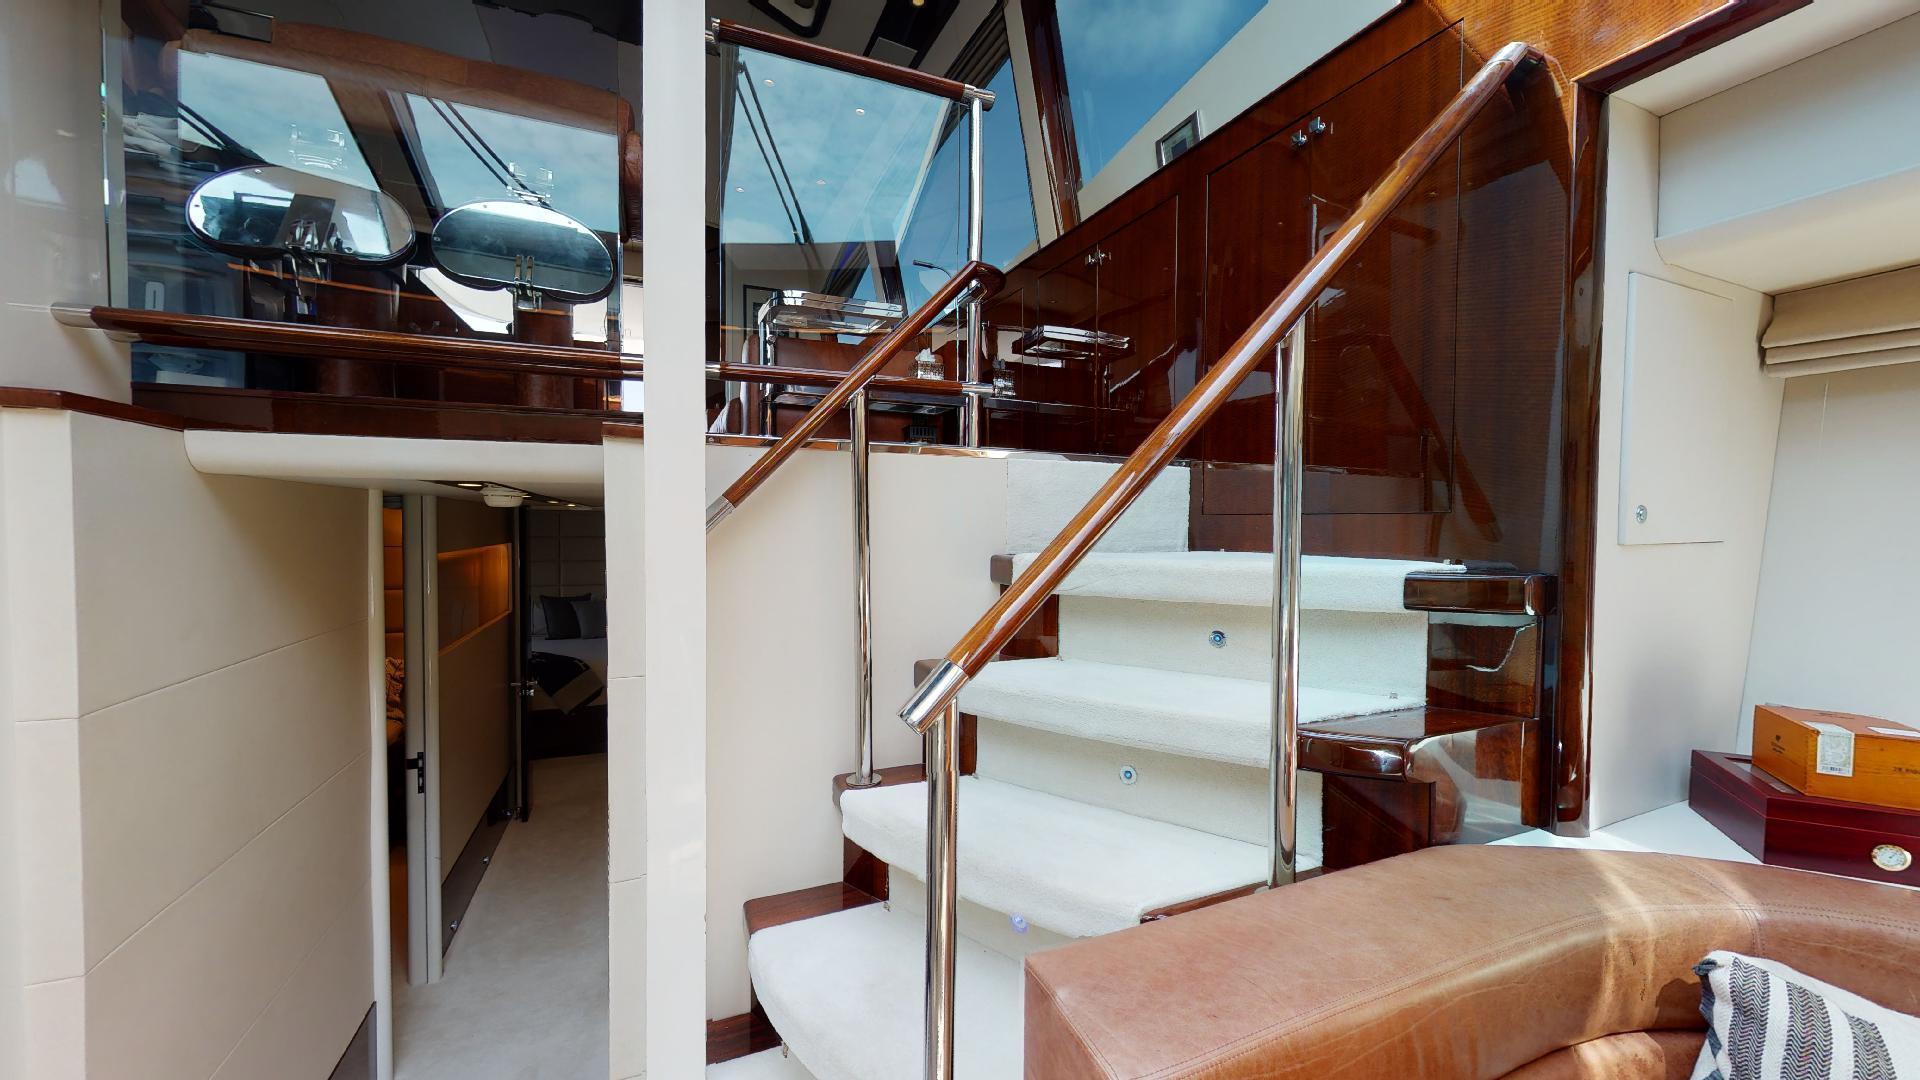 Lazzara-LSX 75 2009-MOJO Fort Lauderdale-Florida-United States-75 Lazzara Stairs to Galley-1462628 | Thumbnail